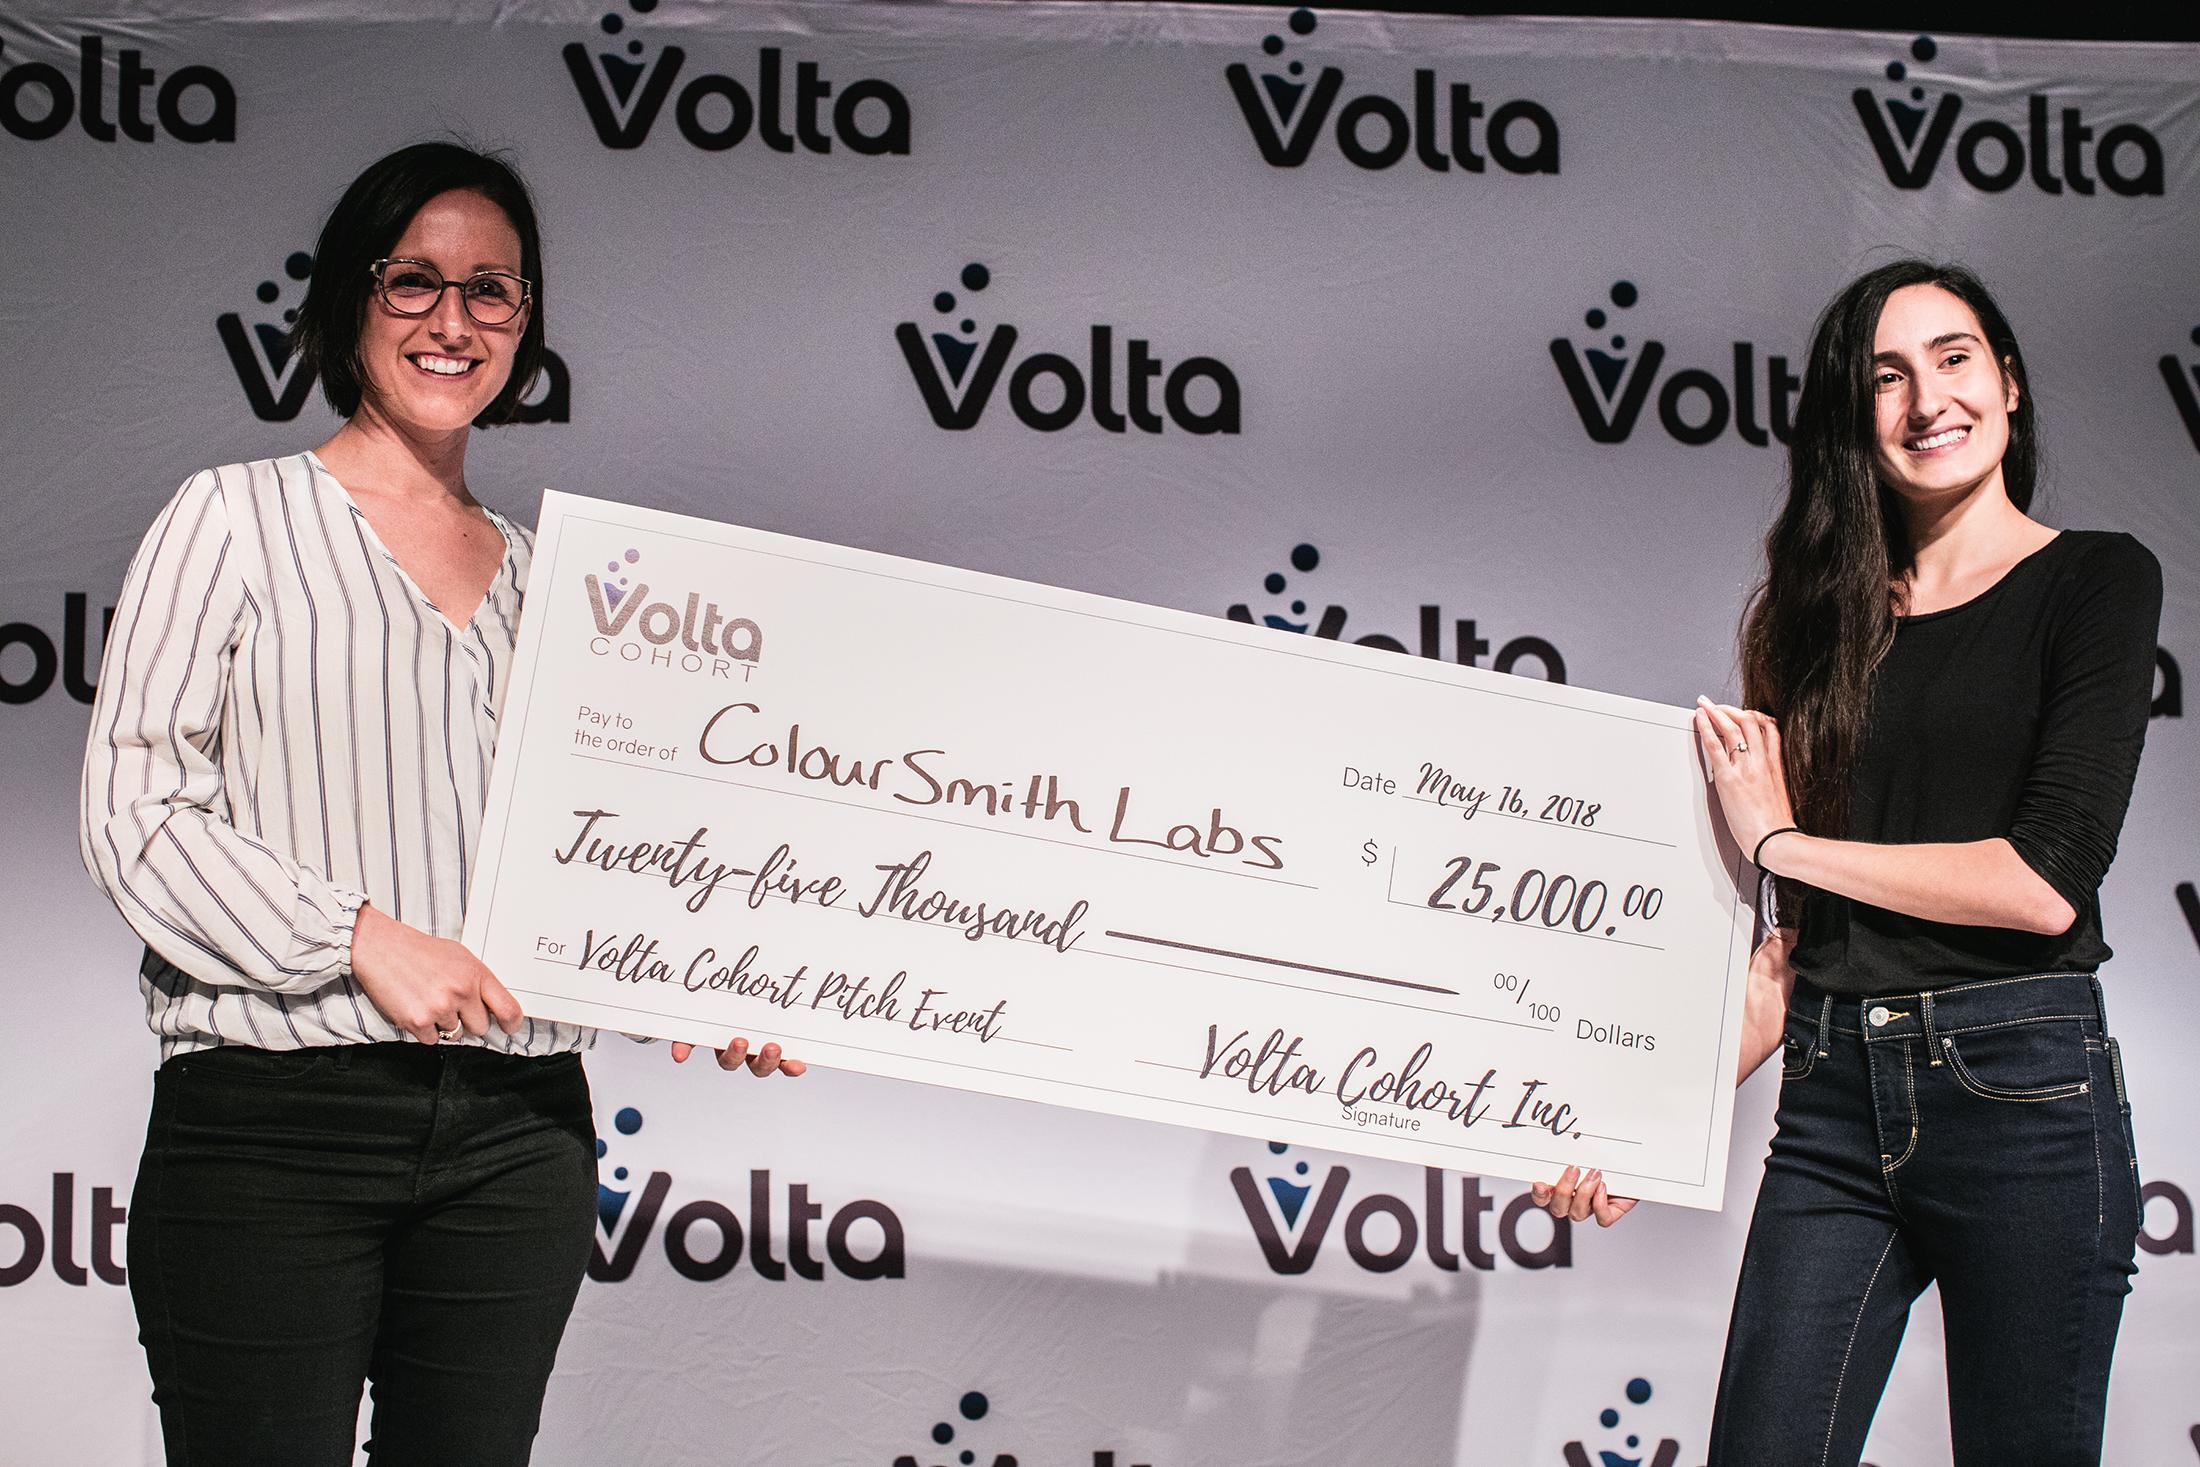 Volta Cohort Winner Coloursmith Labs